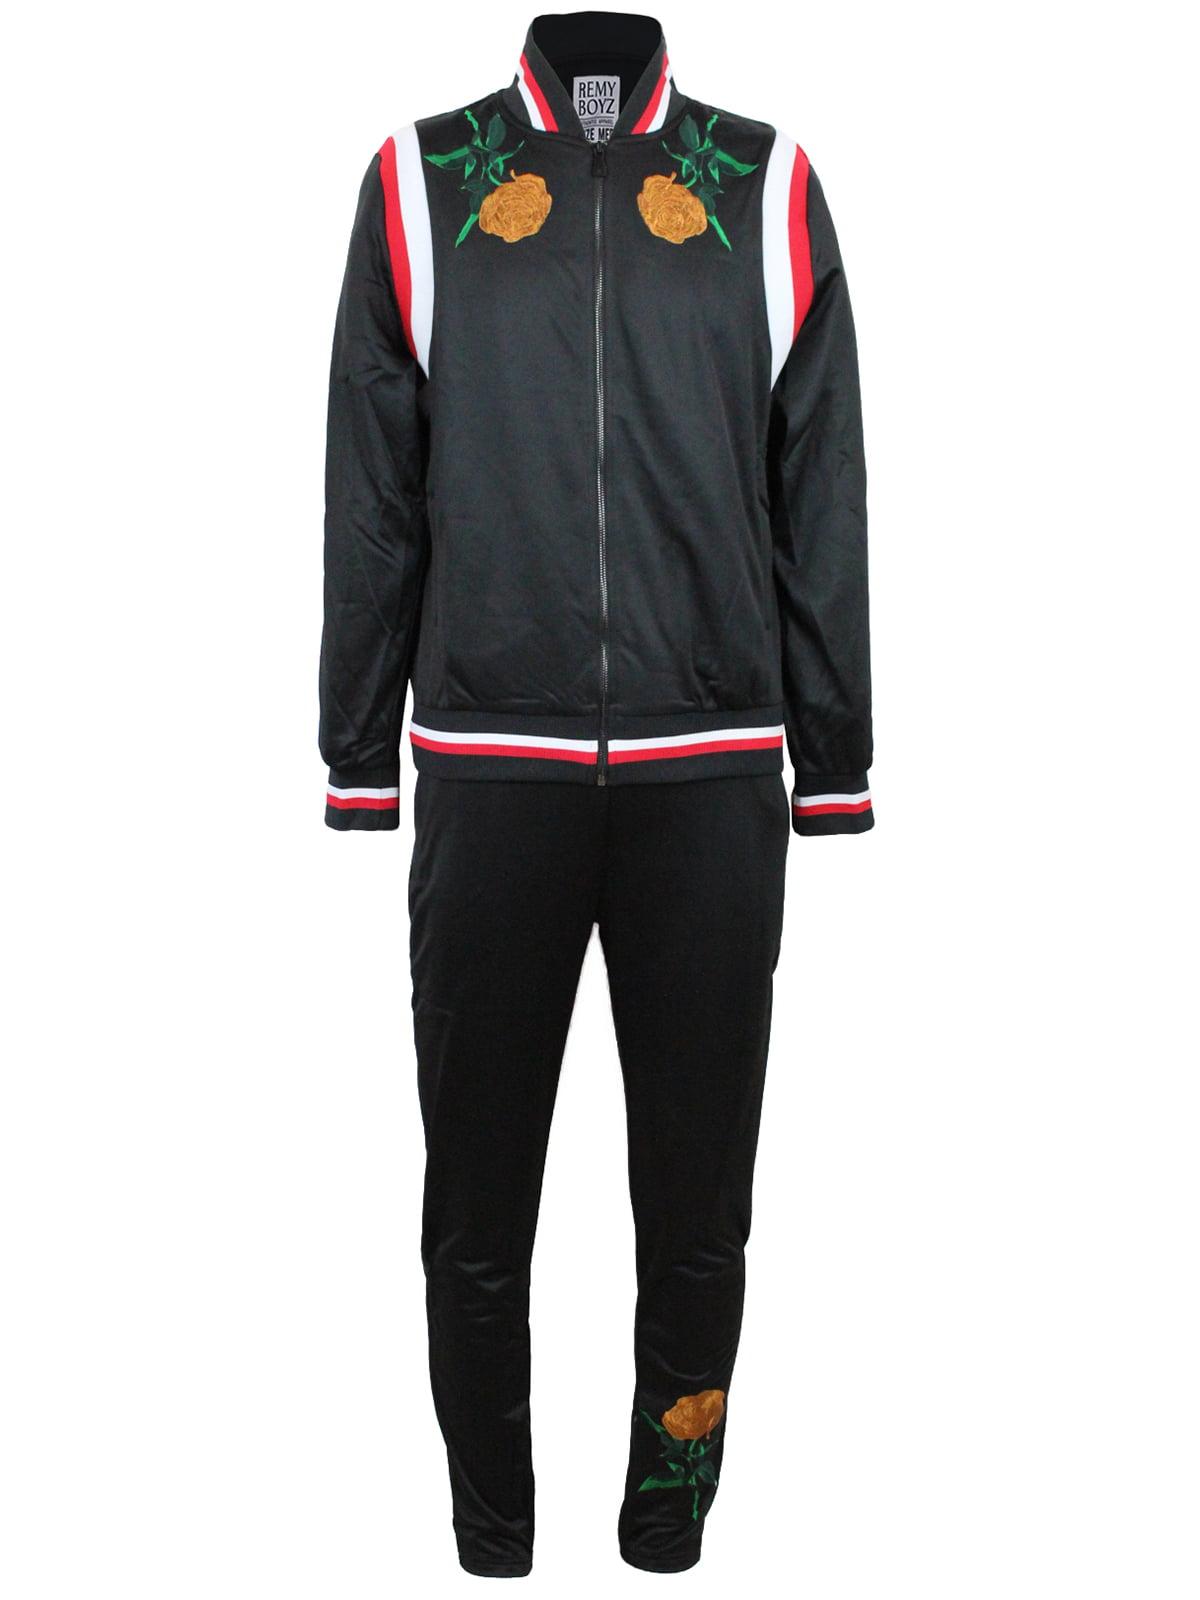 Yusky Mens Basic Style Assorted Colors Long-Sleeve Sweatsuit Set